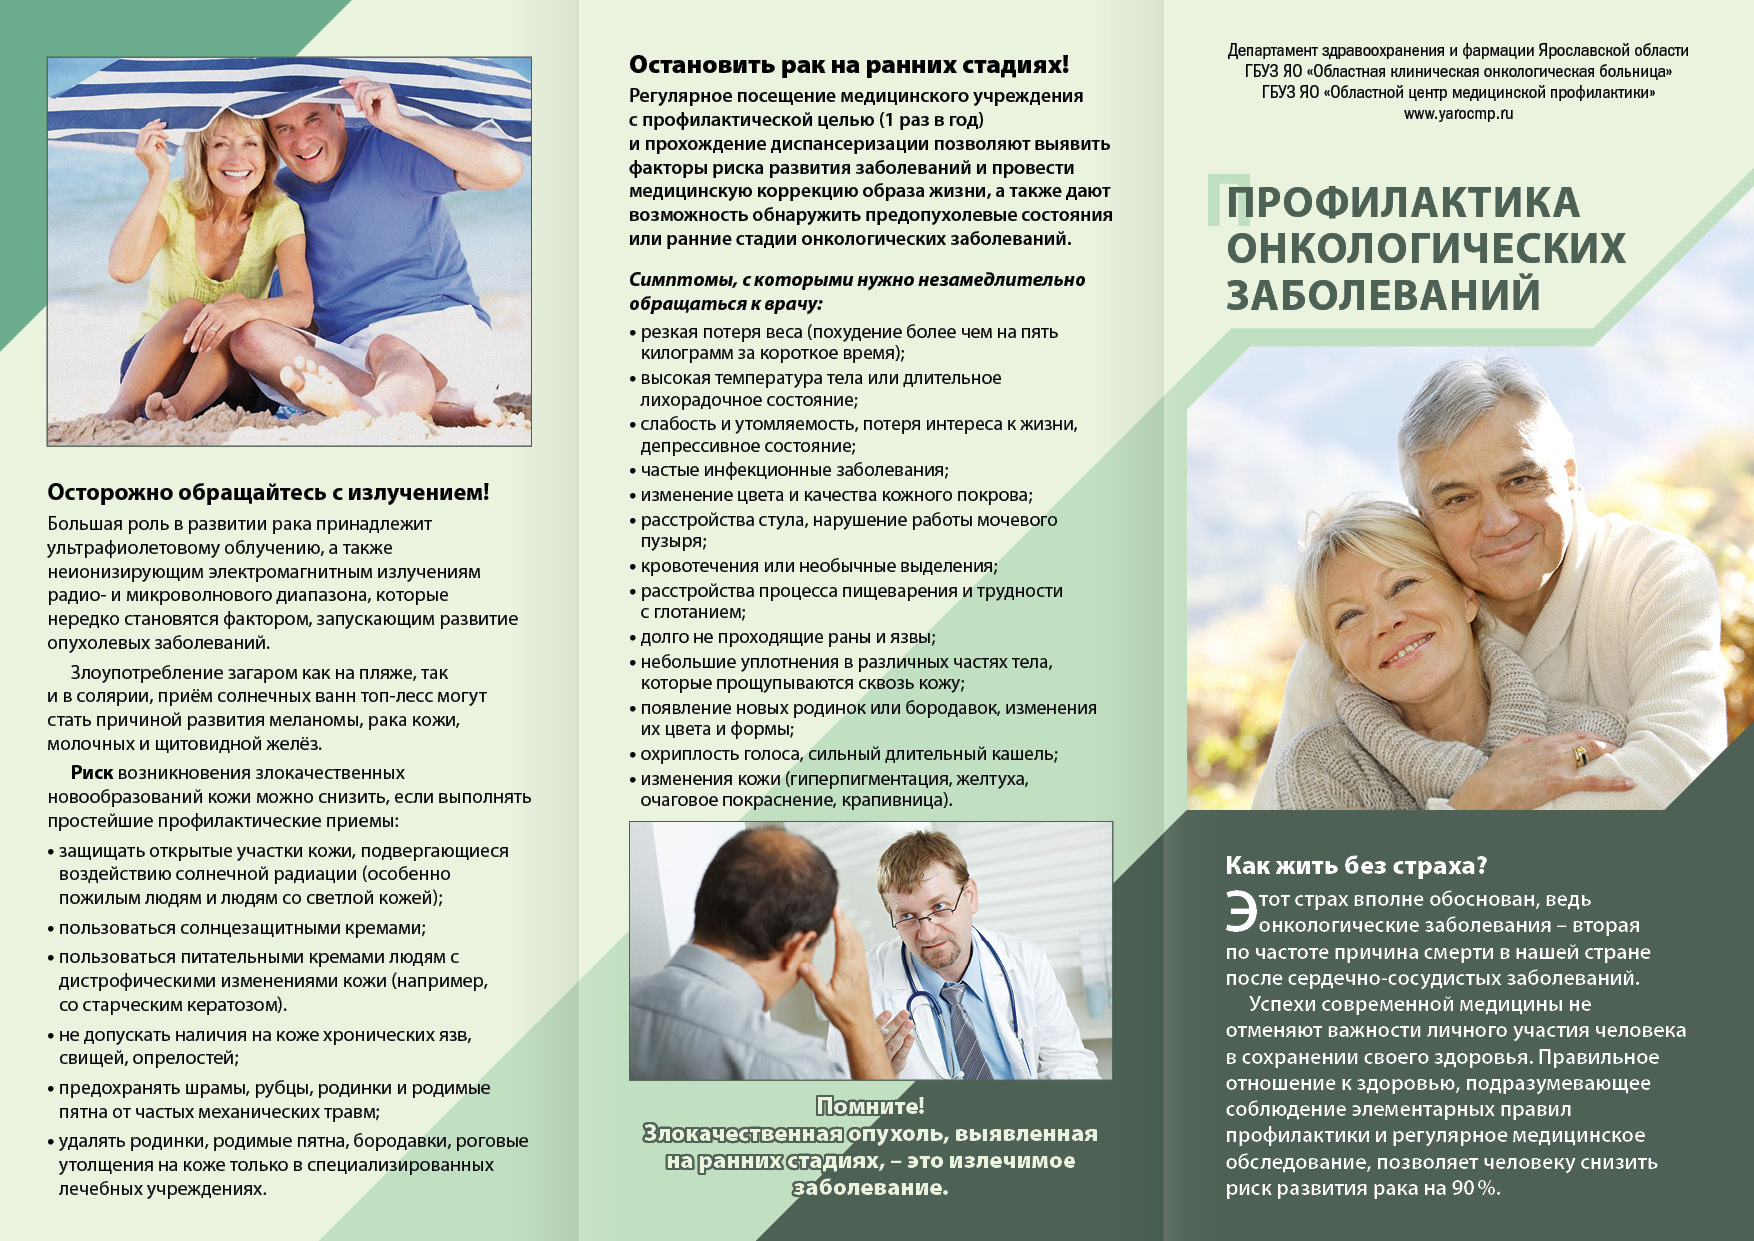 Онкопрофилактика_буклет 1